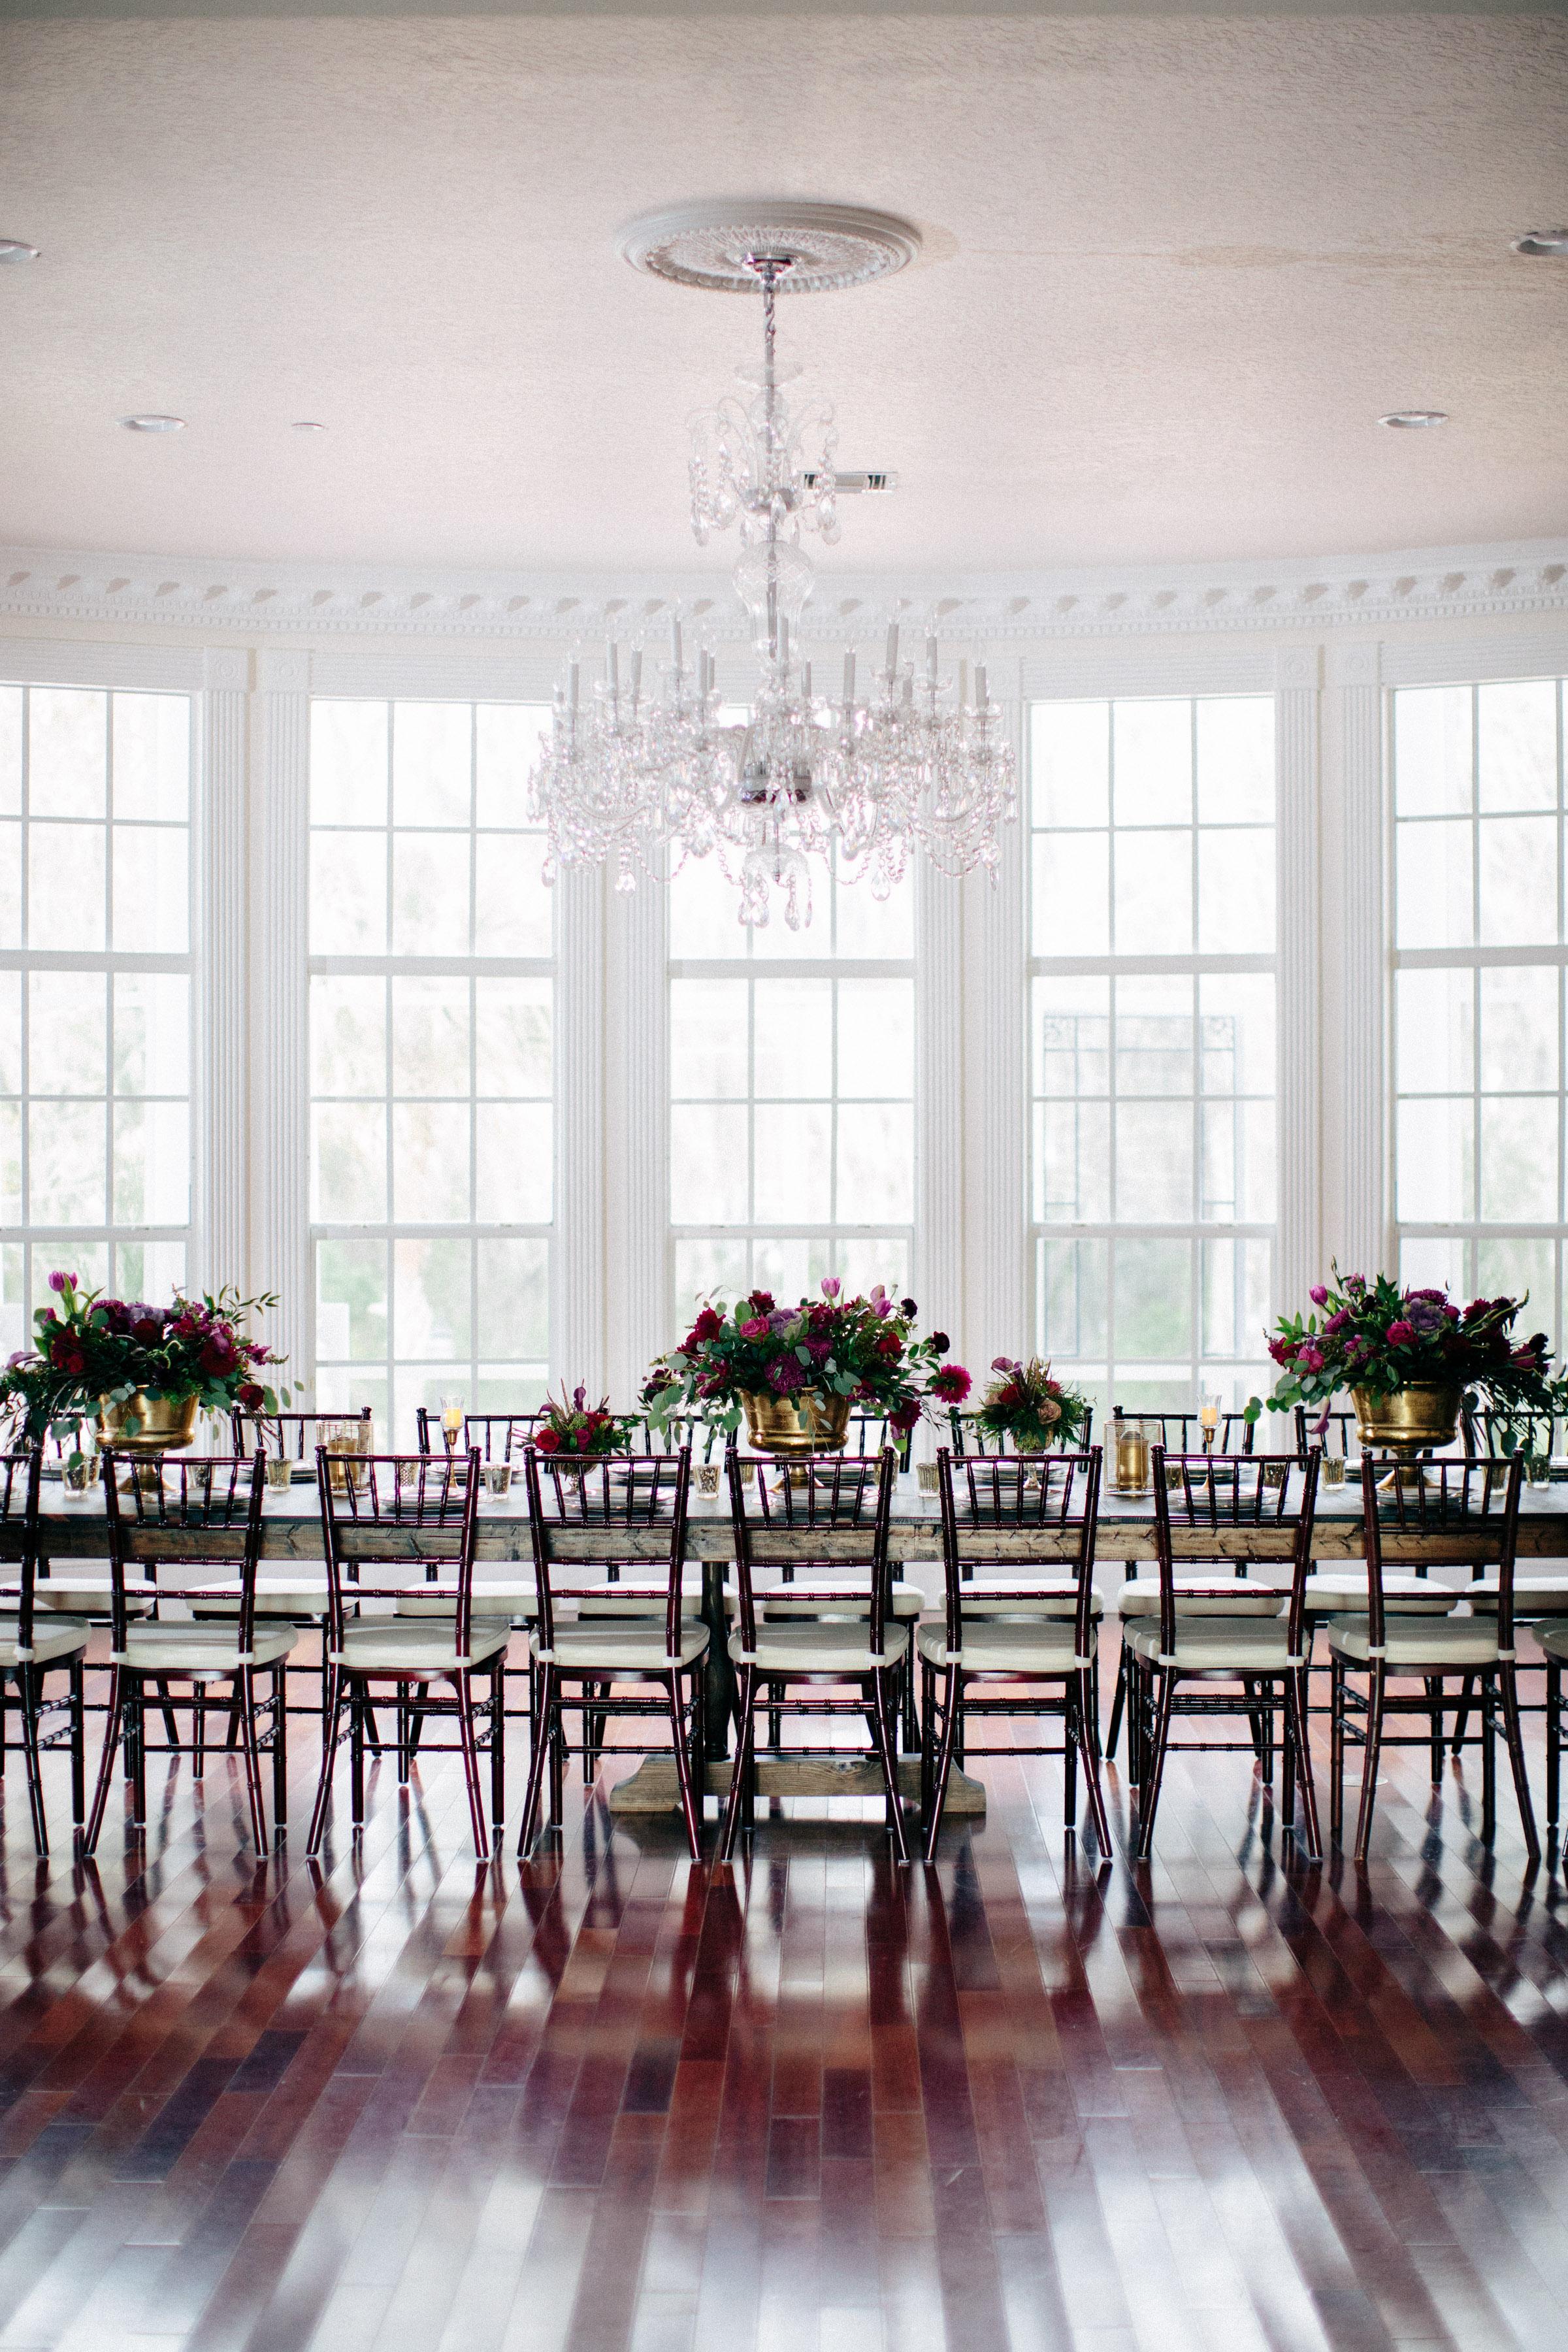 Estate Wedding, Ballroom Reception, Chandelier, farm table, farm table, RW Events, Vintage Rentals, orlando vintage rentals, ballroom wedding, mahogany chiavari chairs, luxury wedding, farm tables, head table